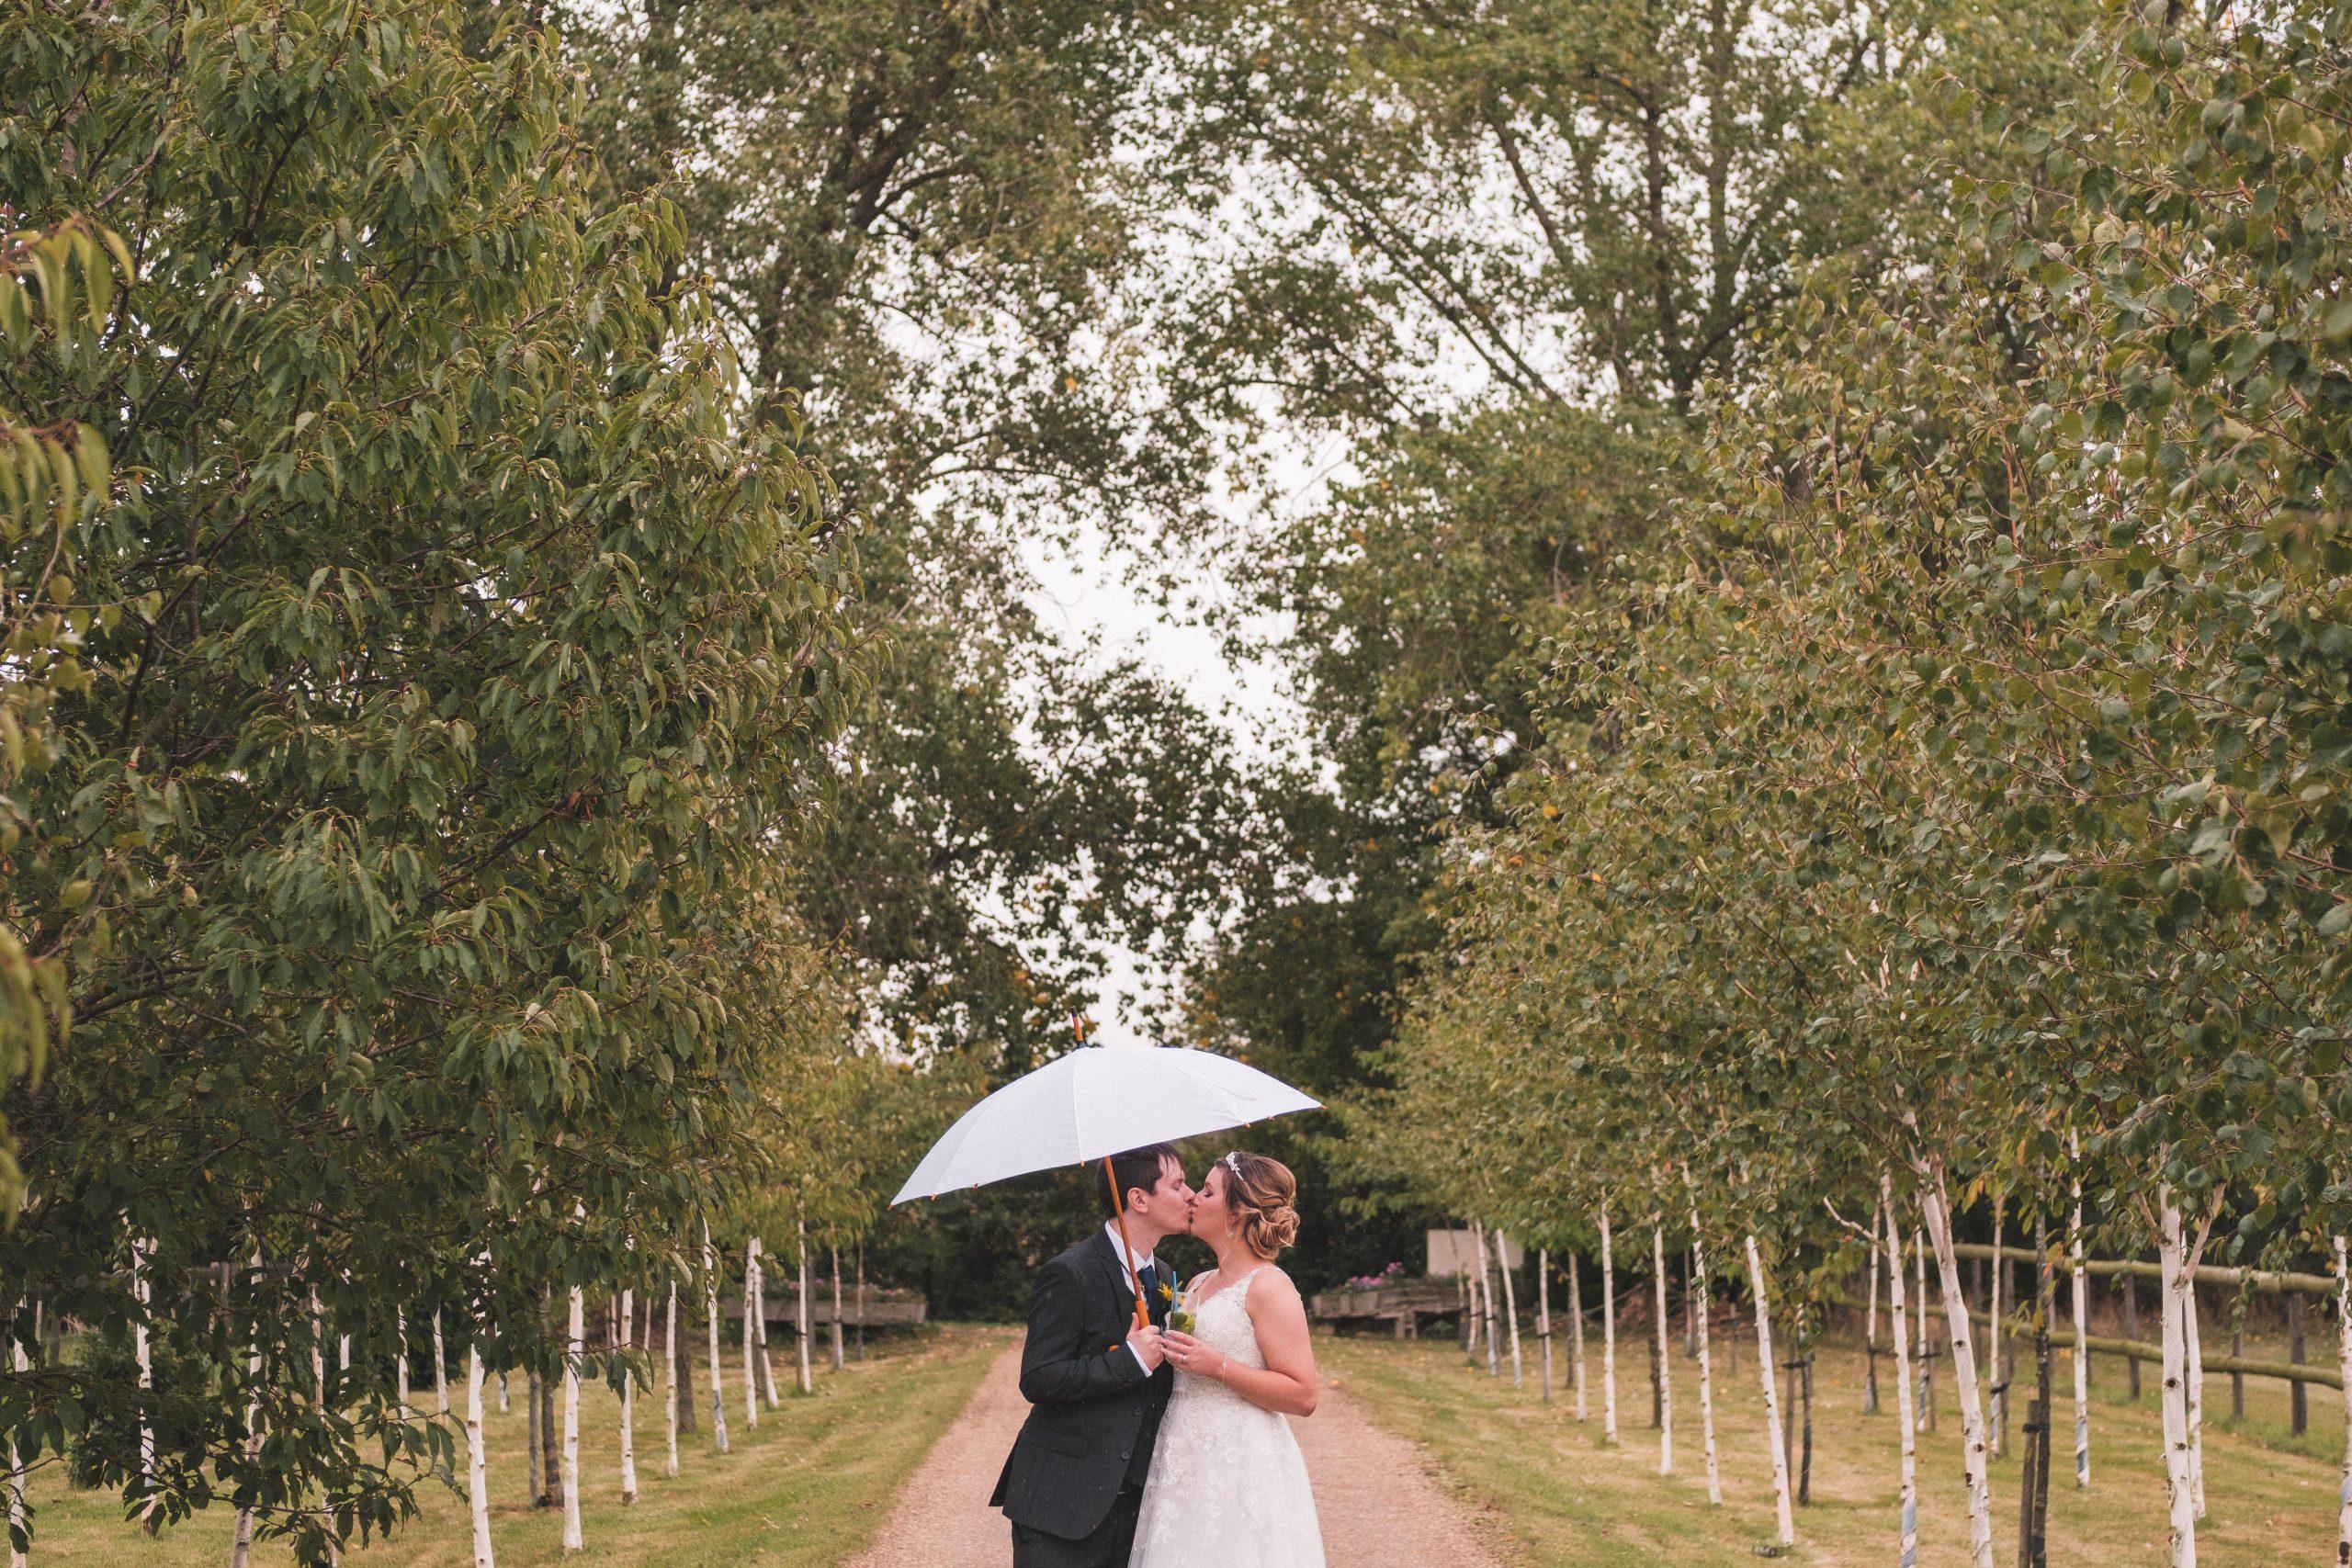 bride and groom with umbrella at Essex wedding